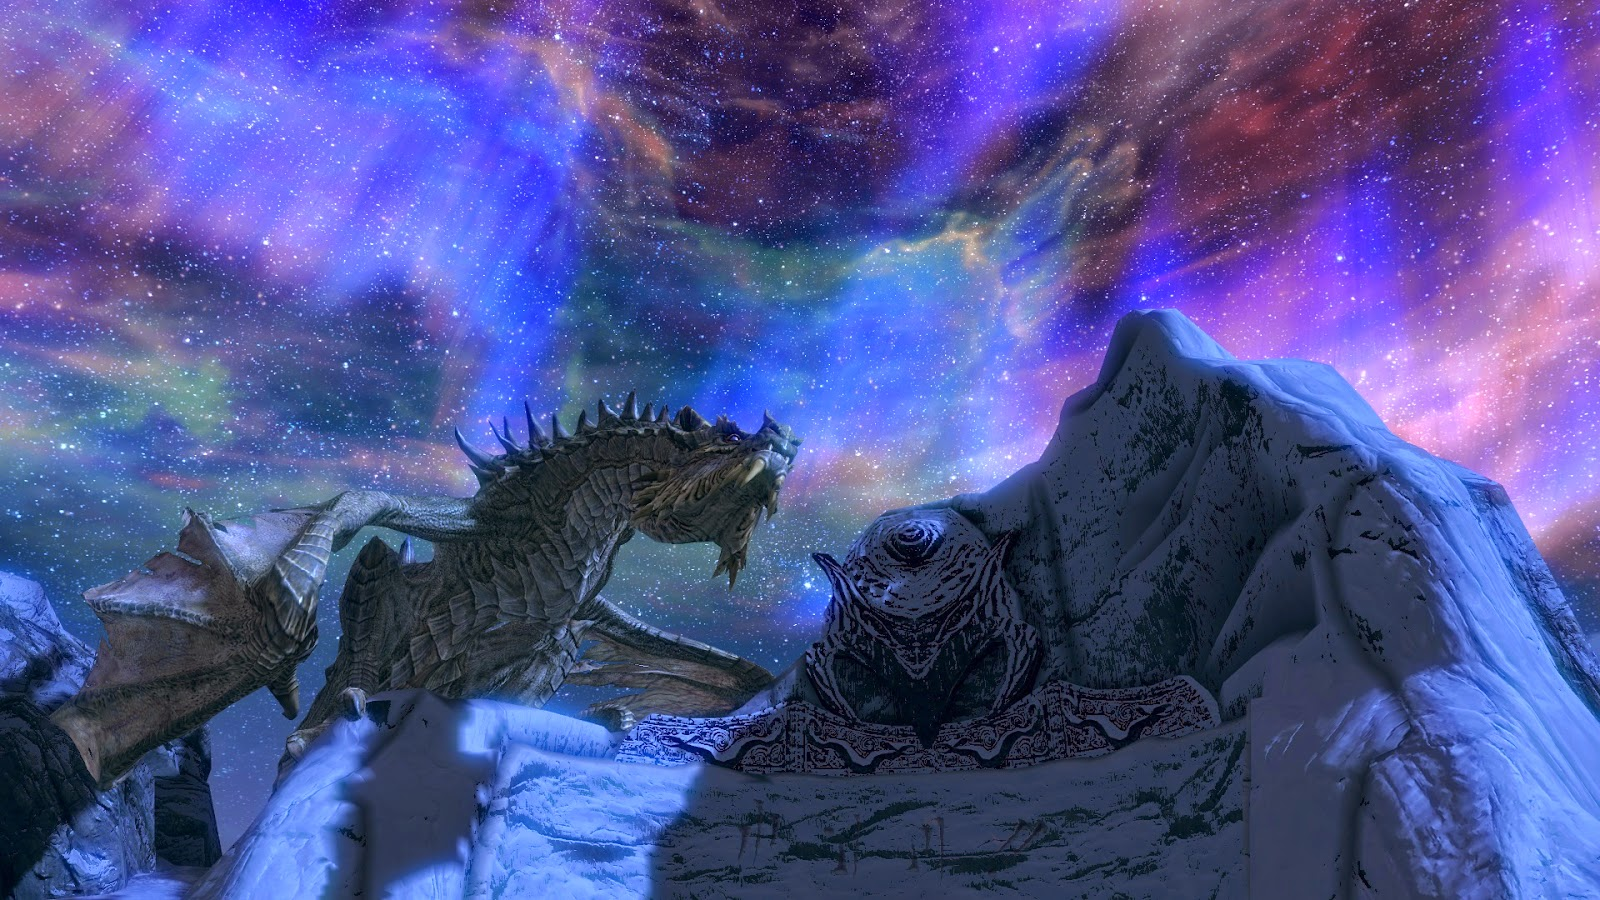 paarthunax,anime wallpaper,anime scenery